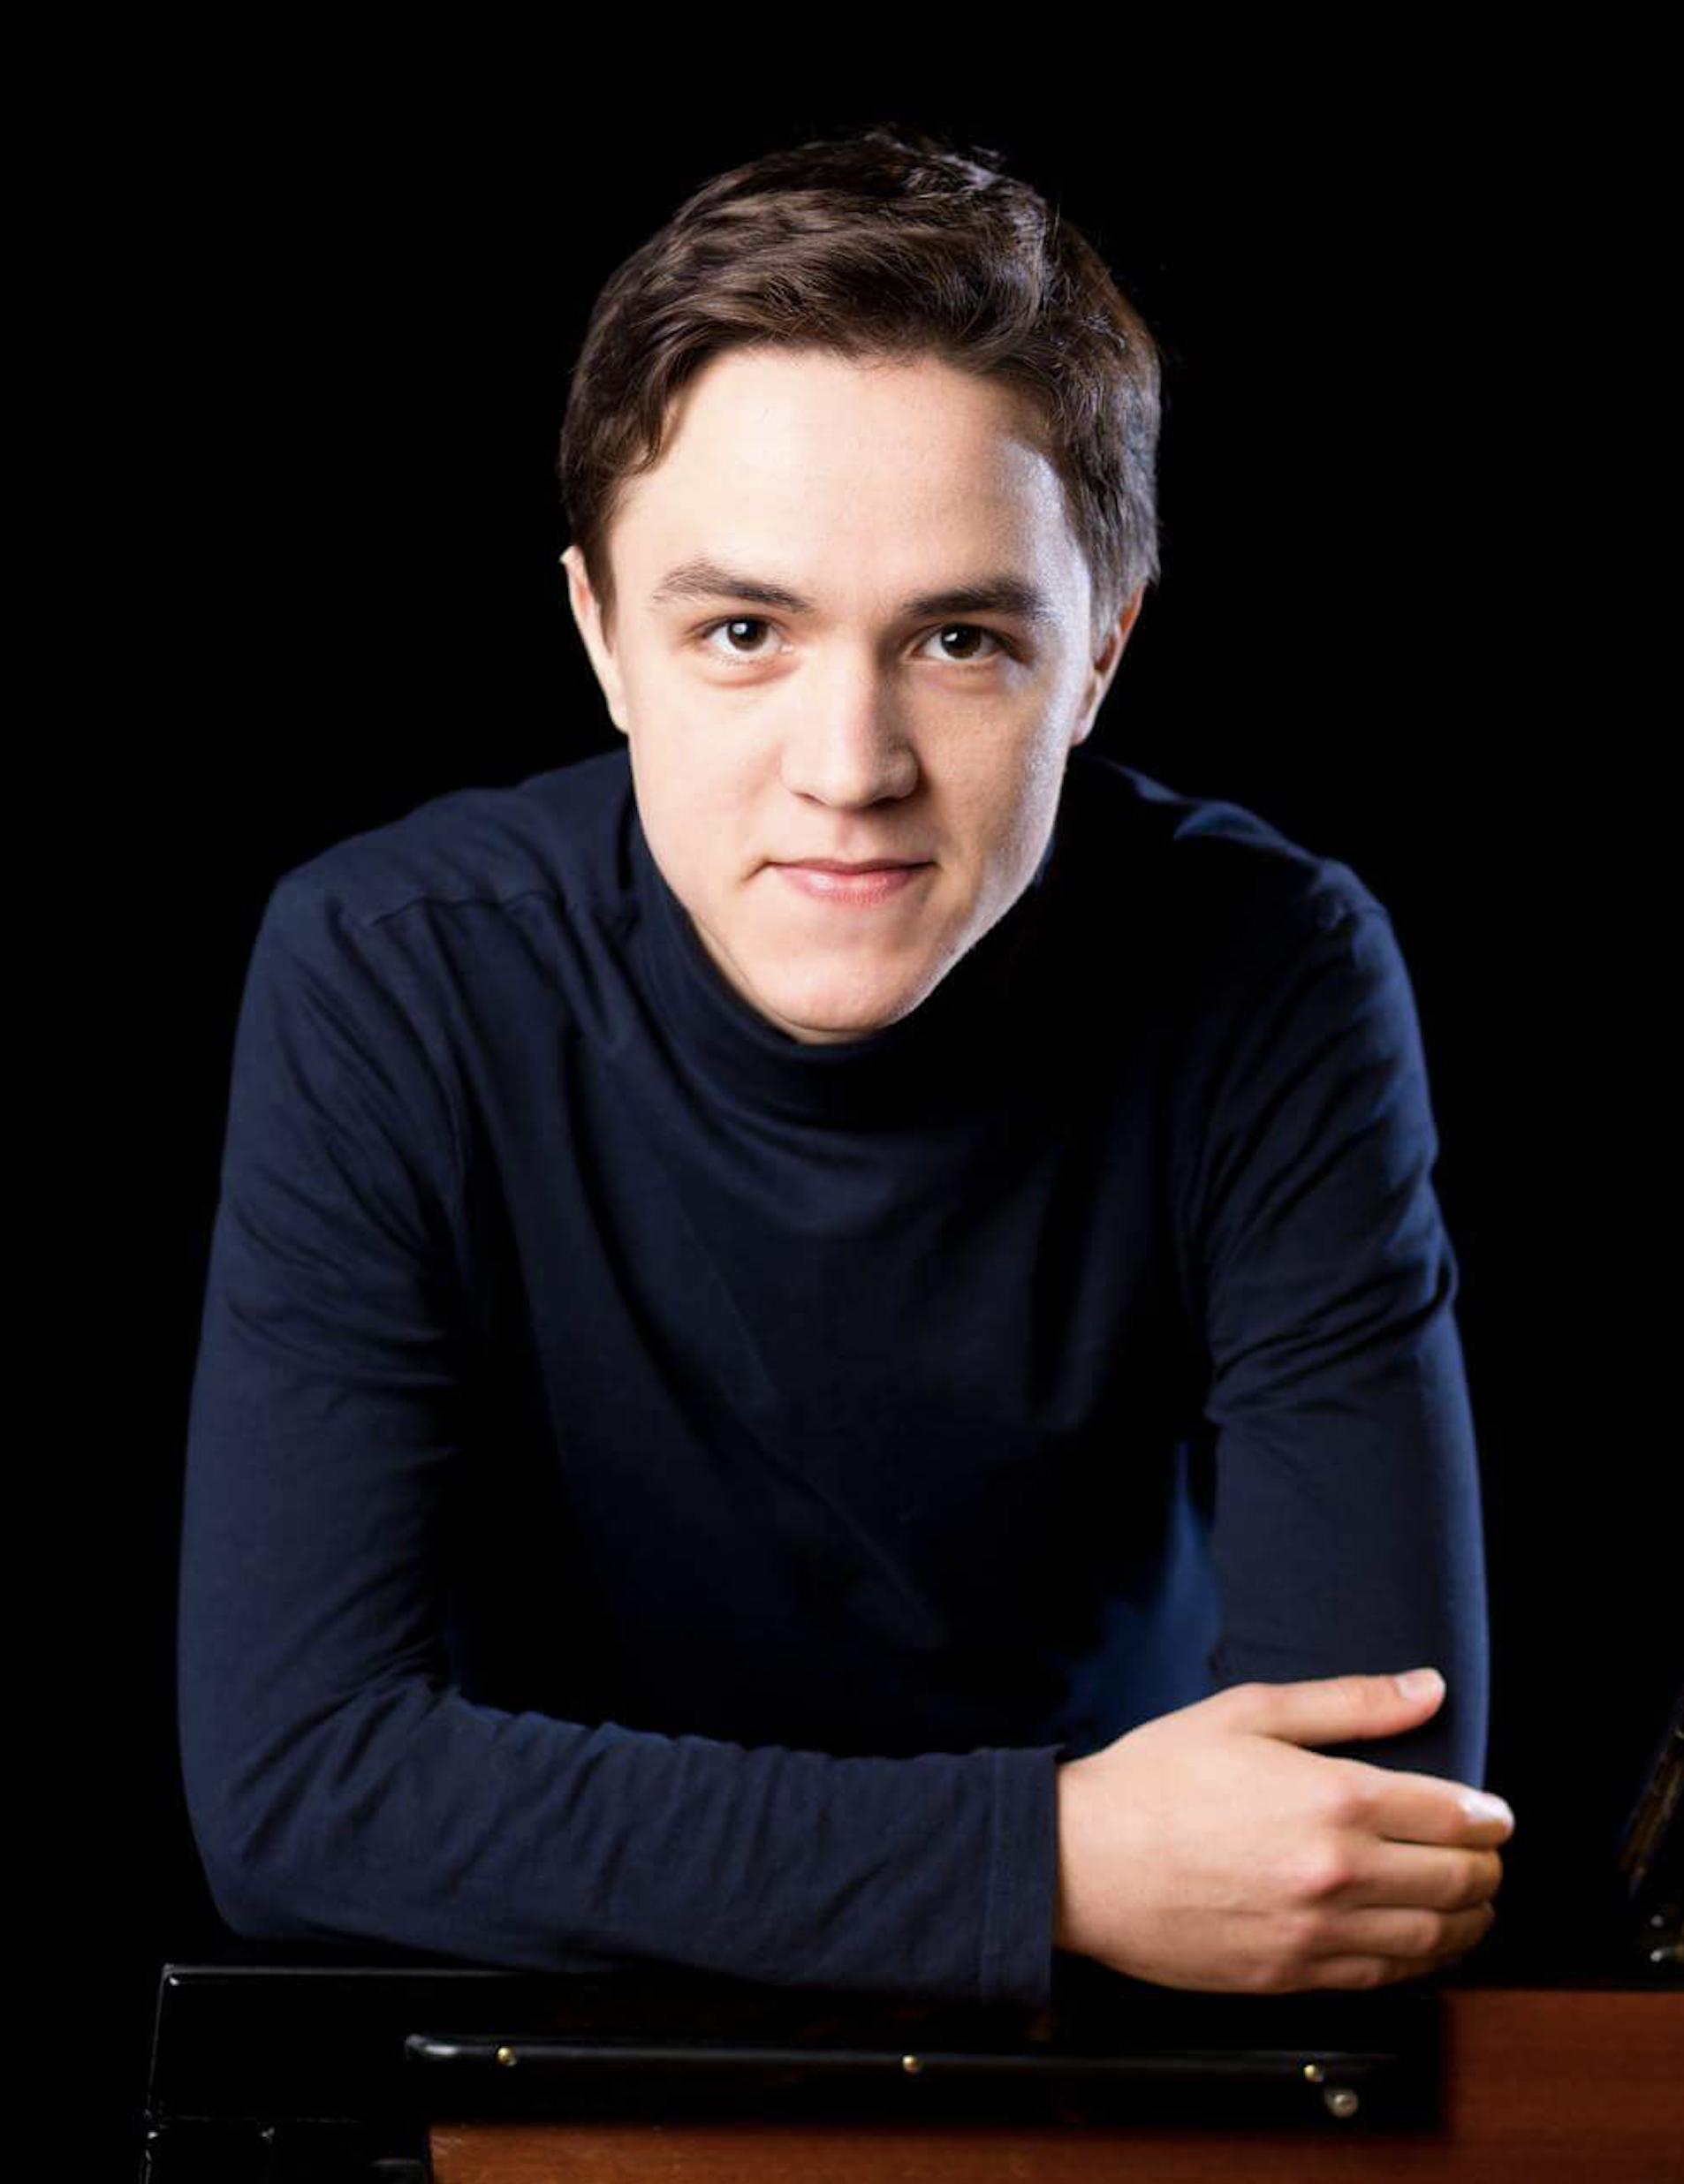 Oleksandr Leonov